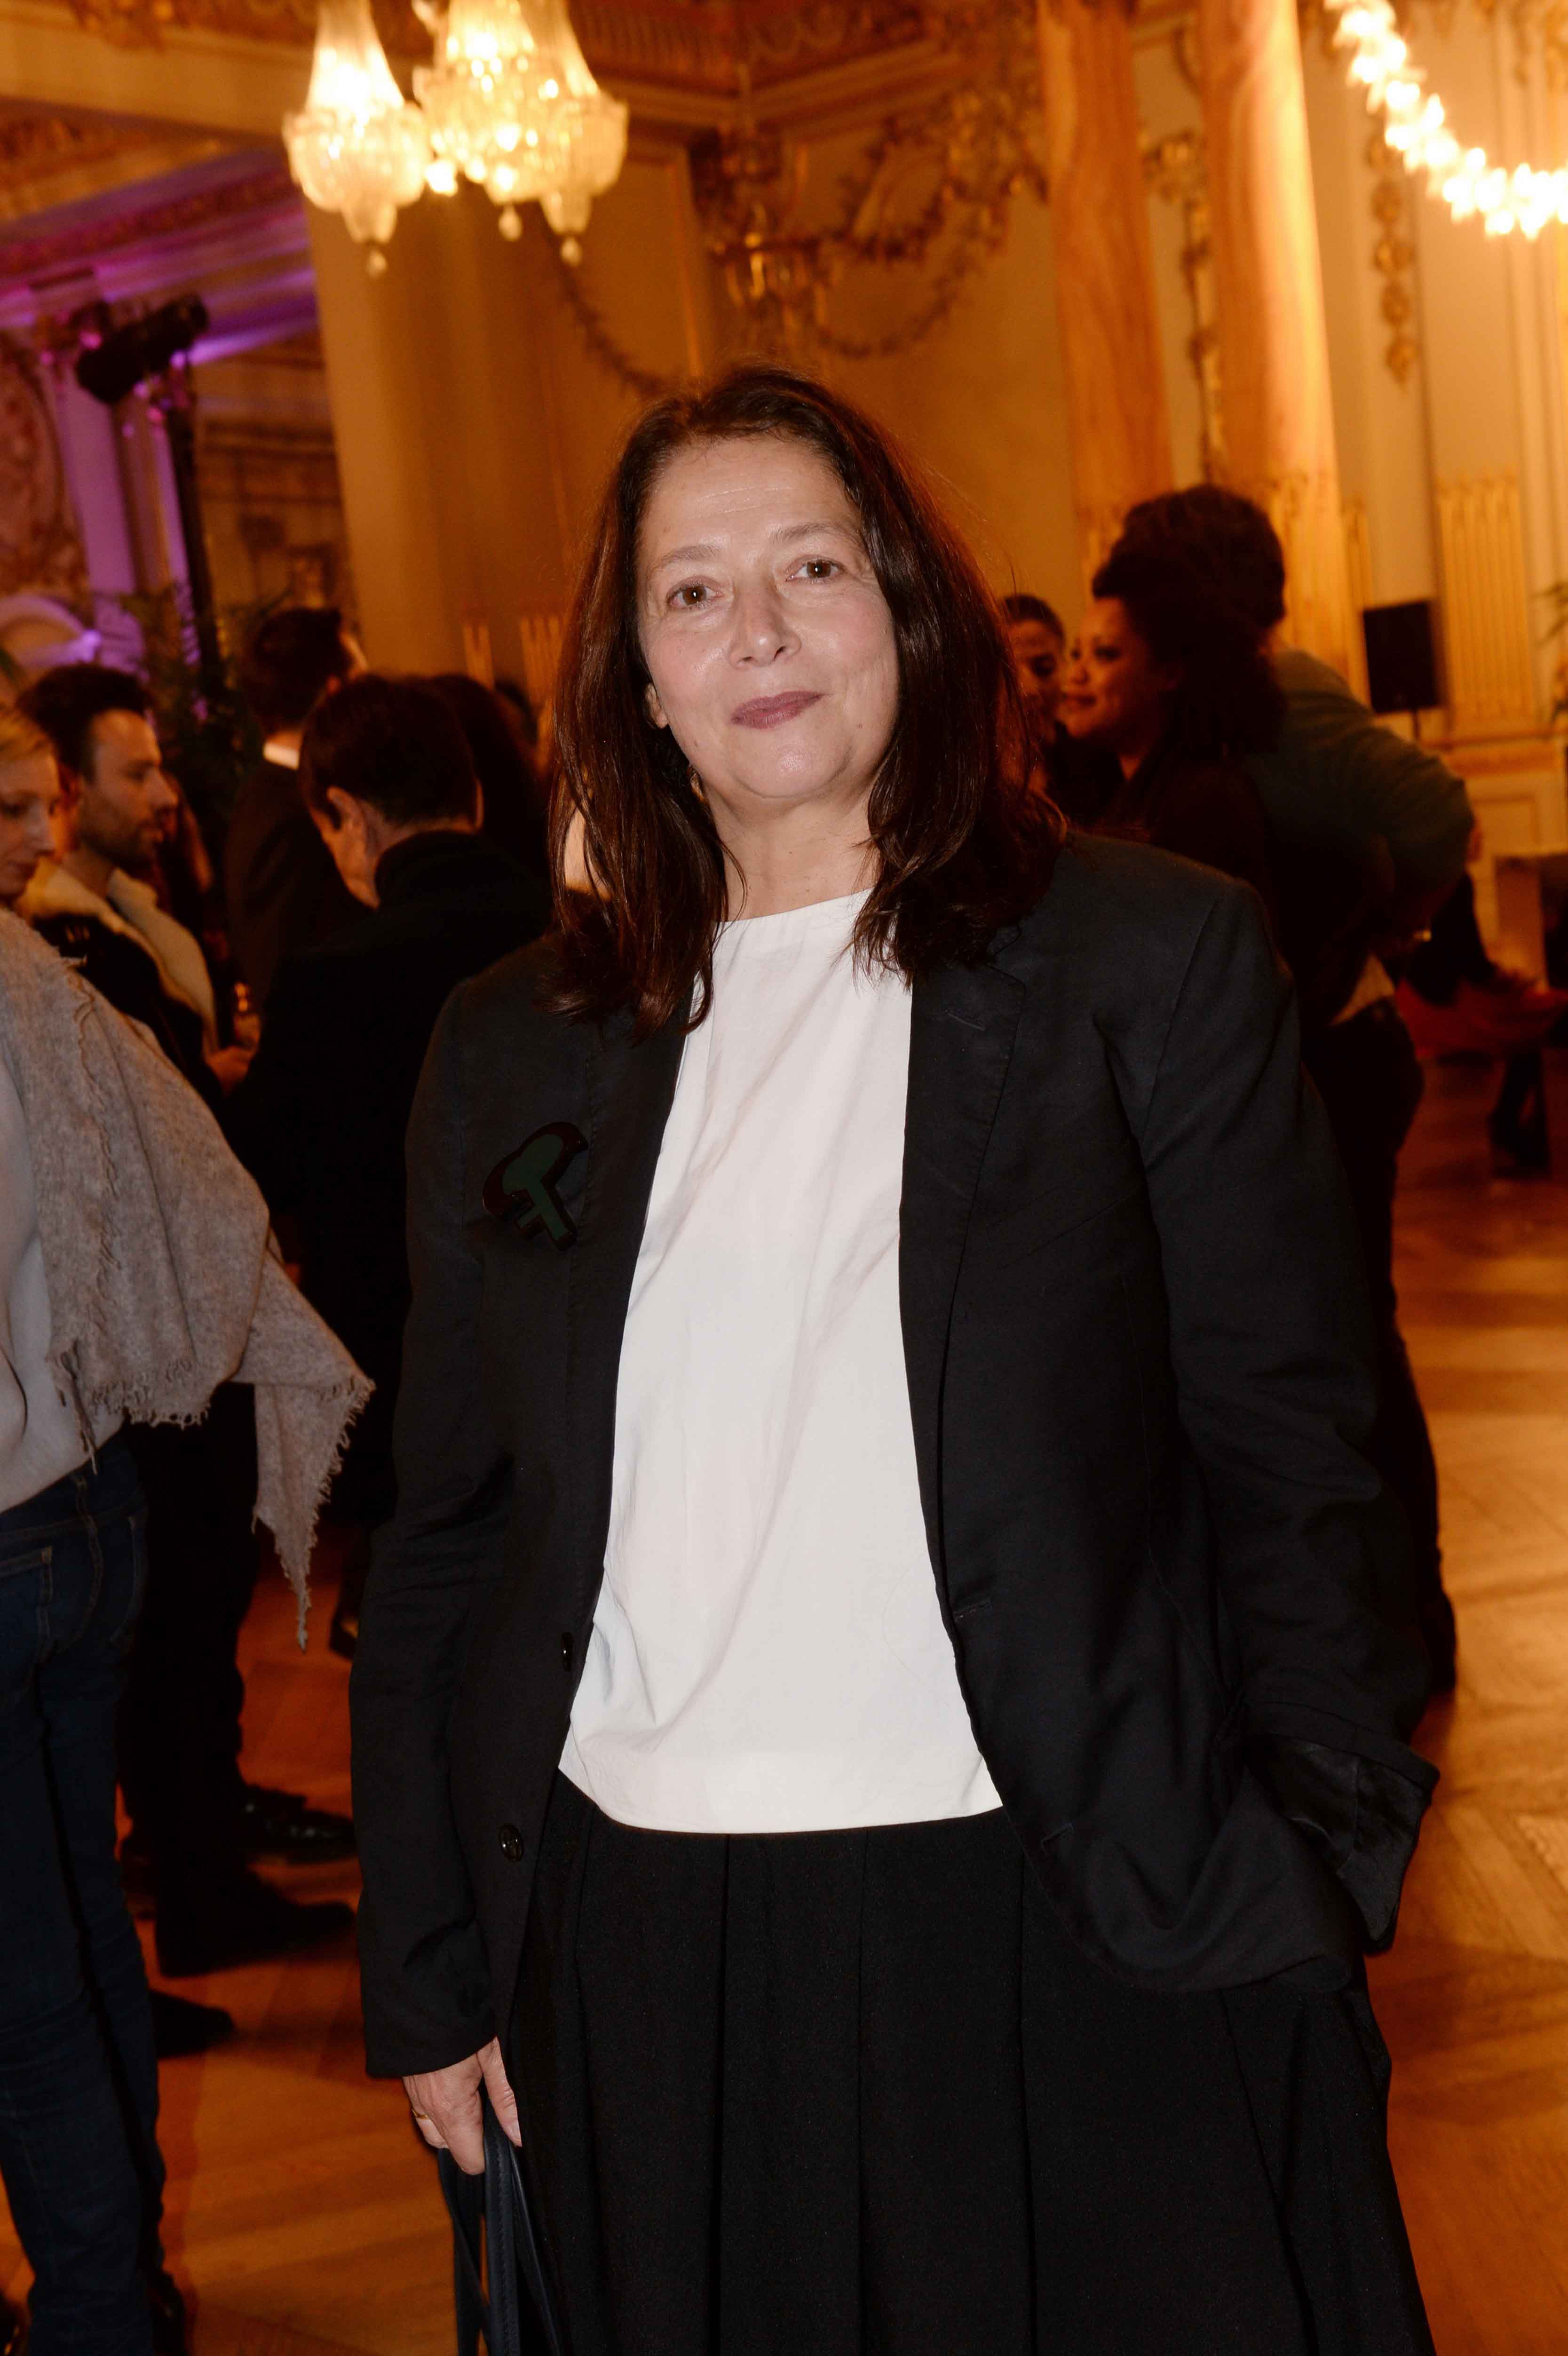 Christine Innamorato